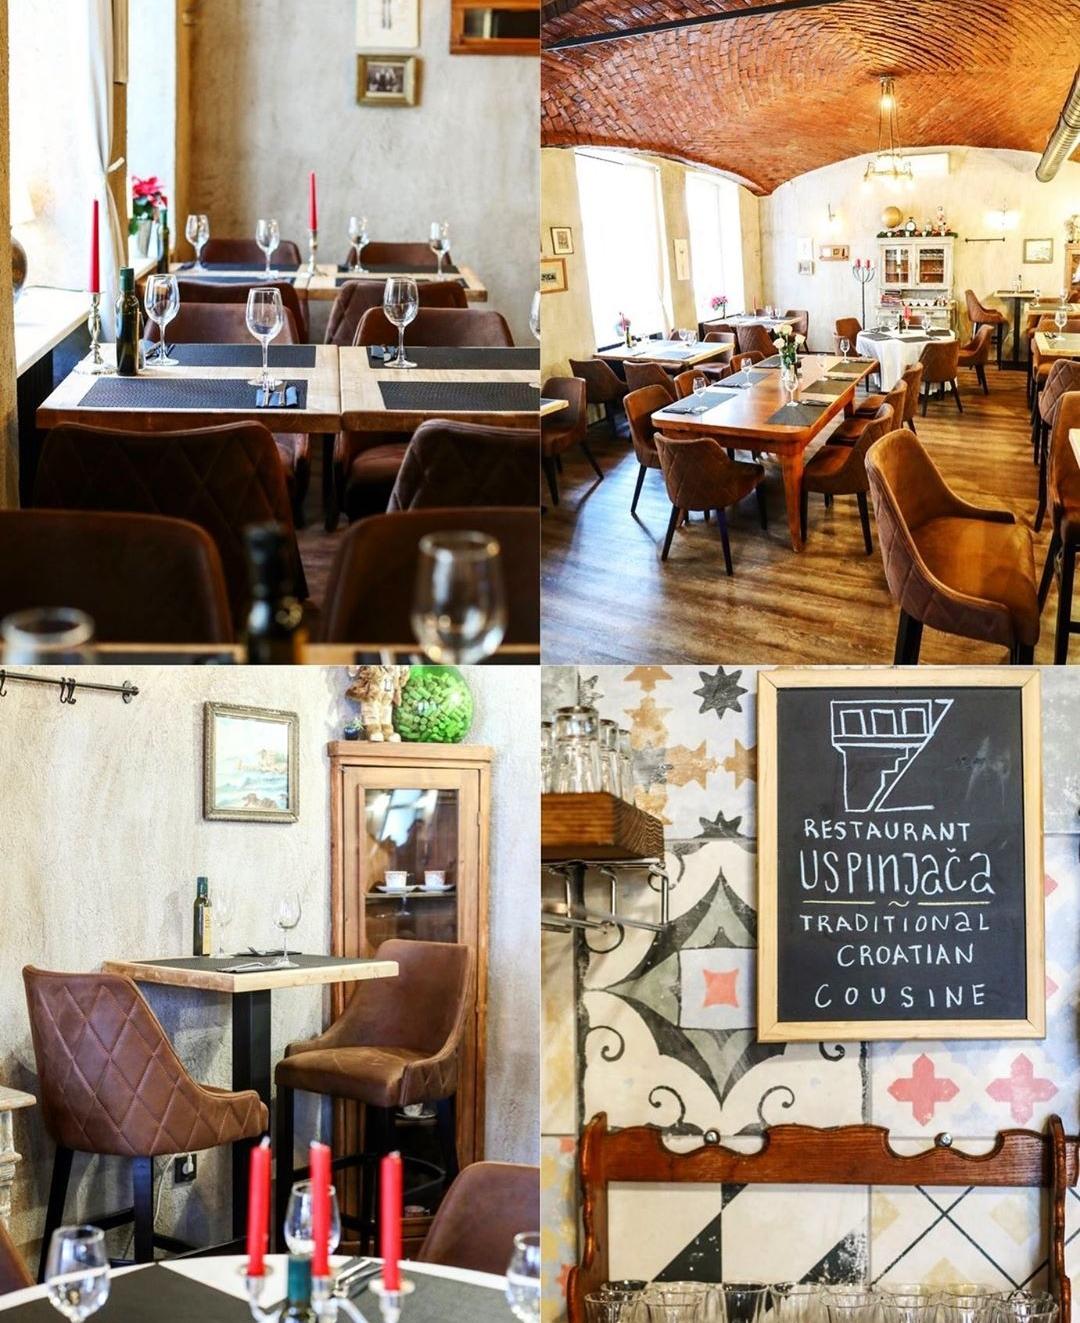 Uspinjaca 21 Tjedan Restorana